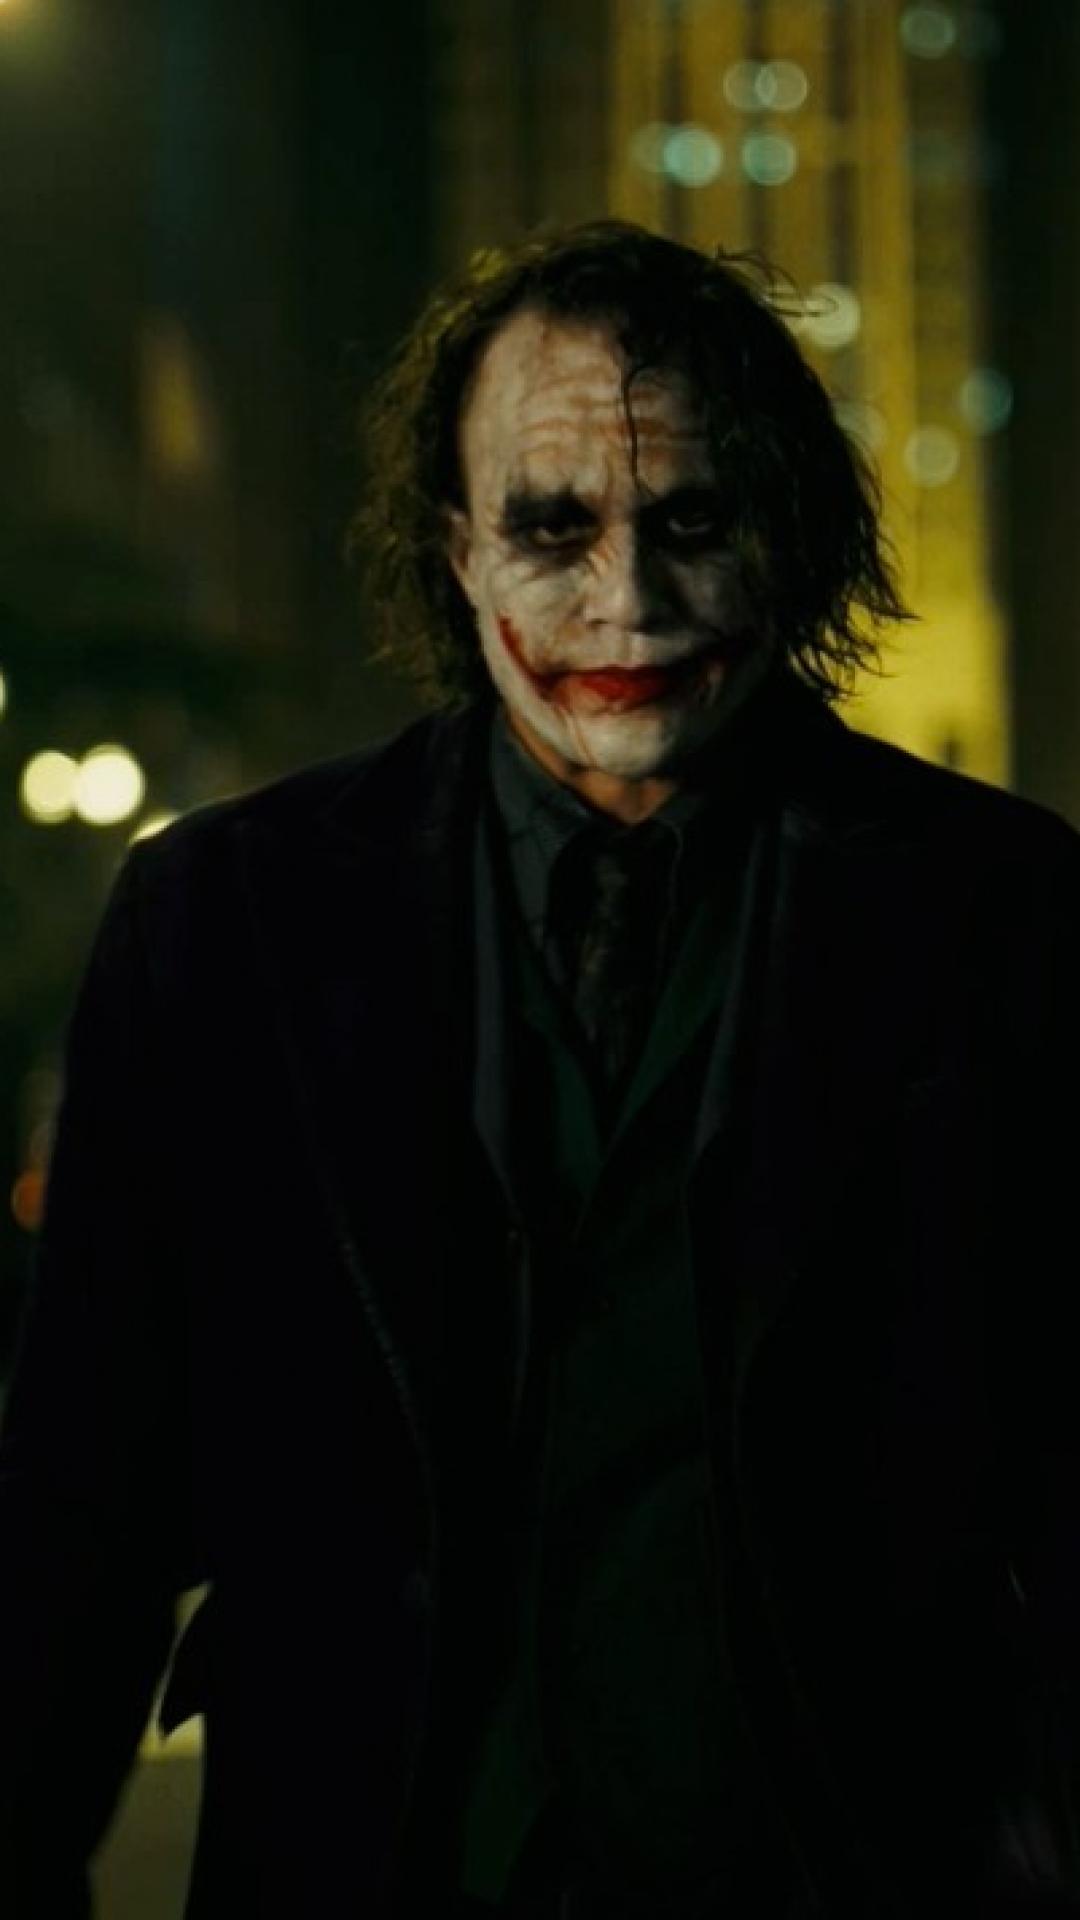 75 Heath Ledger Joker Wallpapers Hd Wallpaperyou 720x1280 Download Hd Wallpaper Wallpapertip